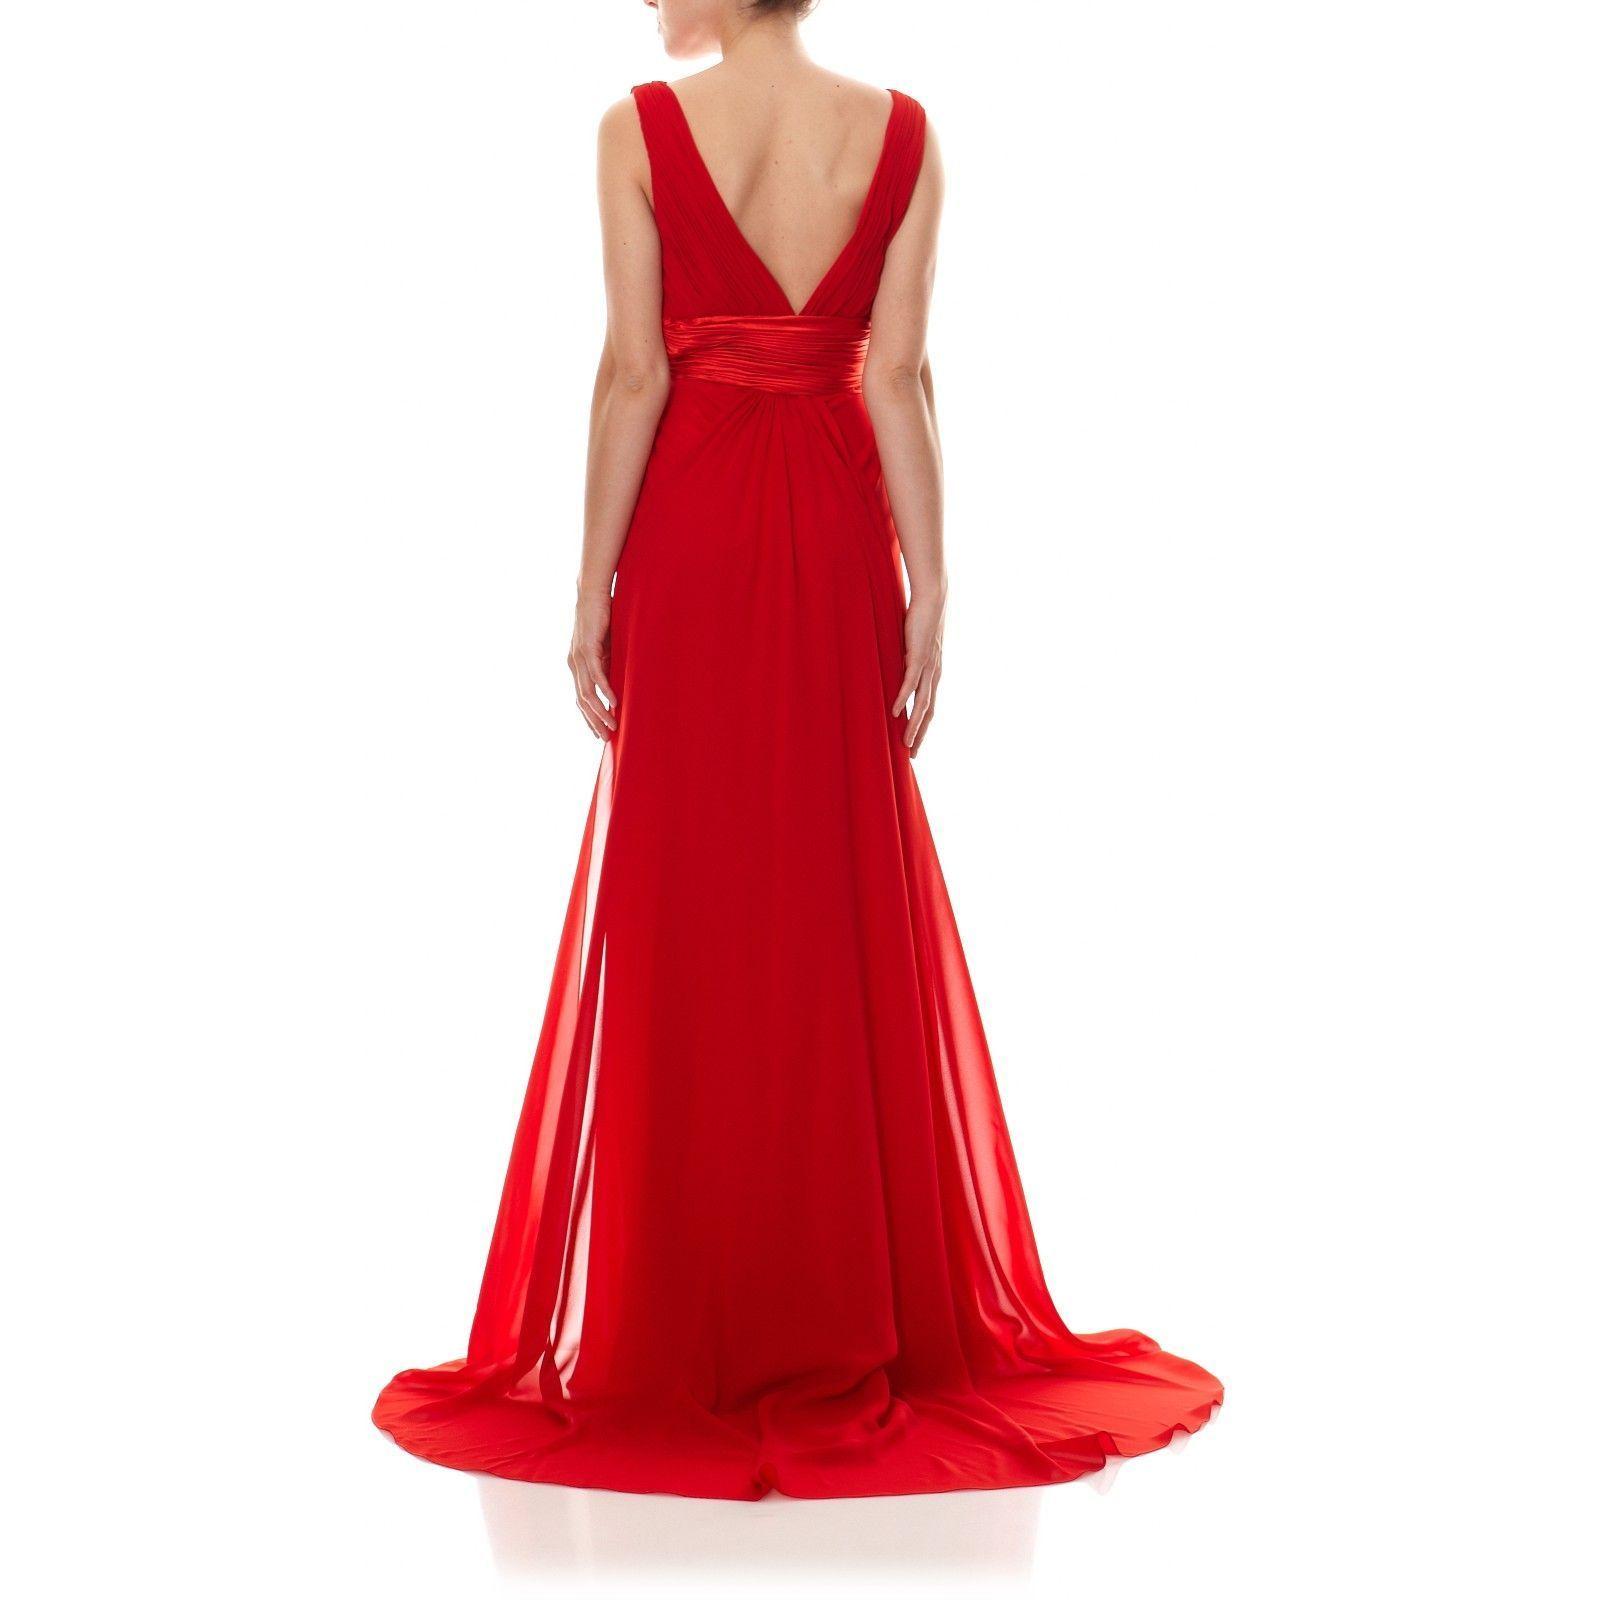 0a2e9dca7ae Robe de soirée - rouge - Faust - Ref  1390364